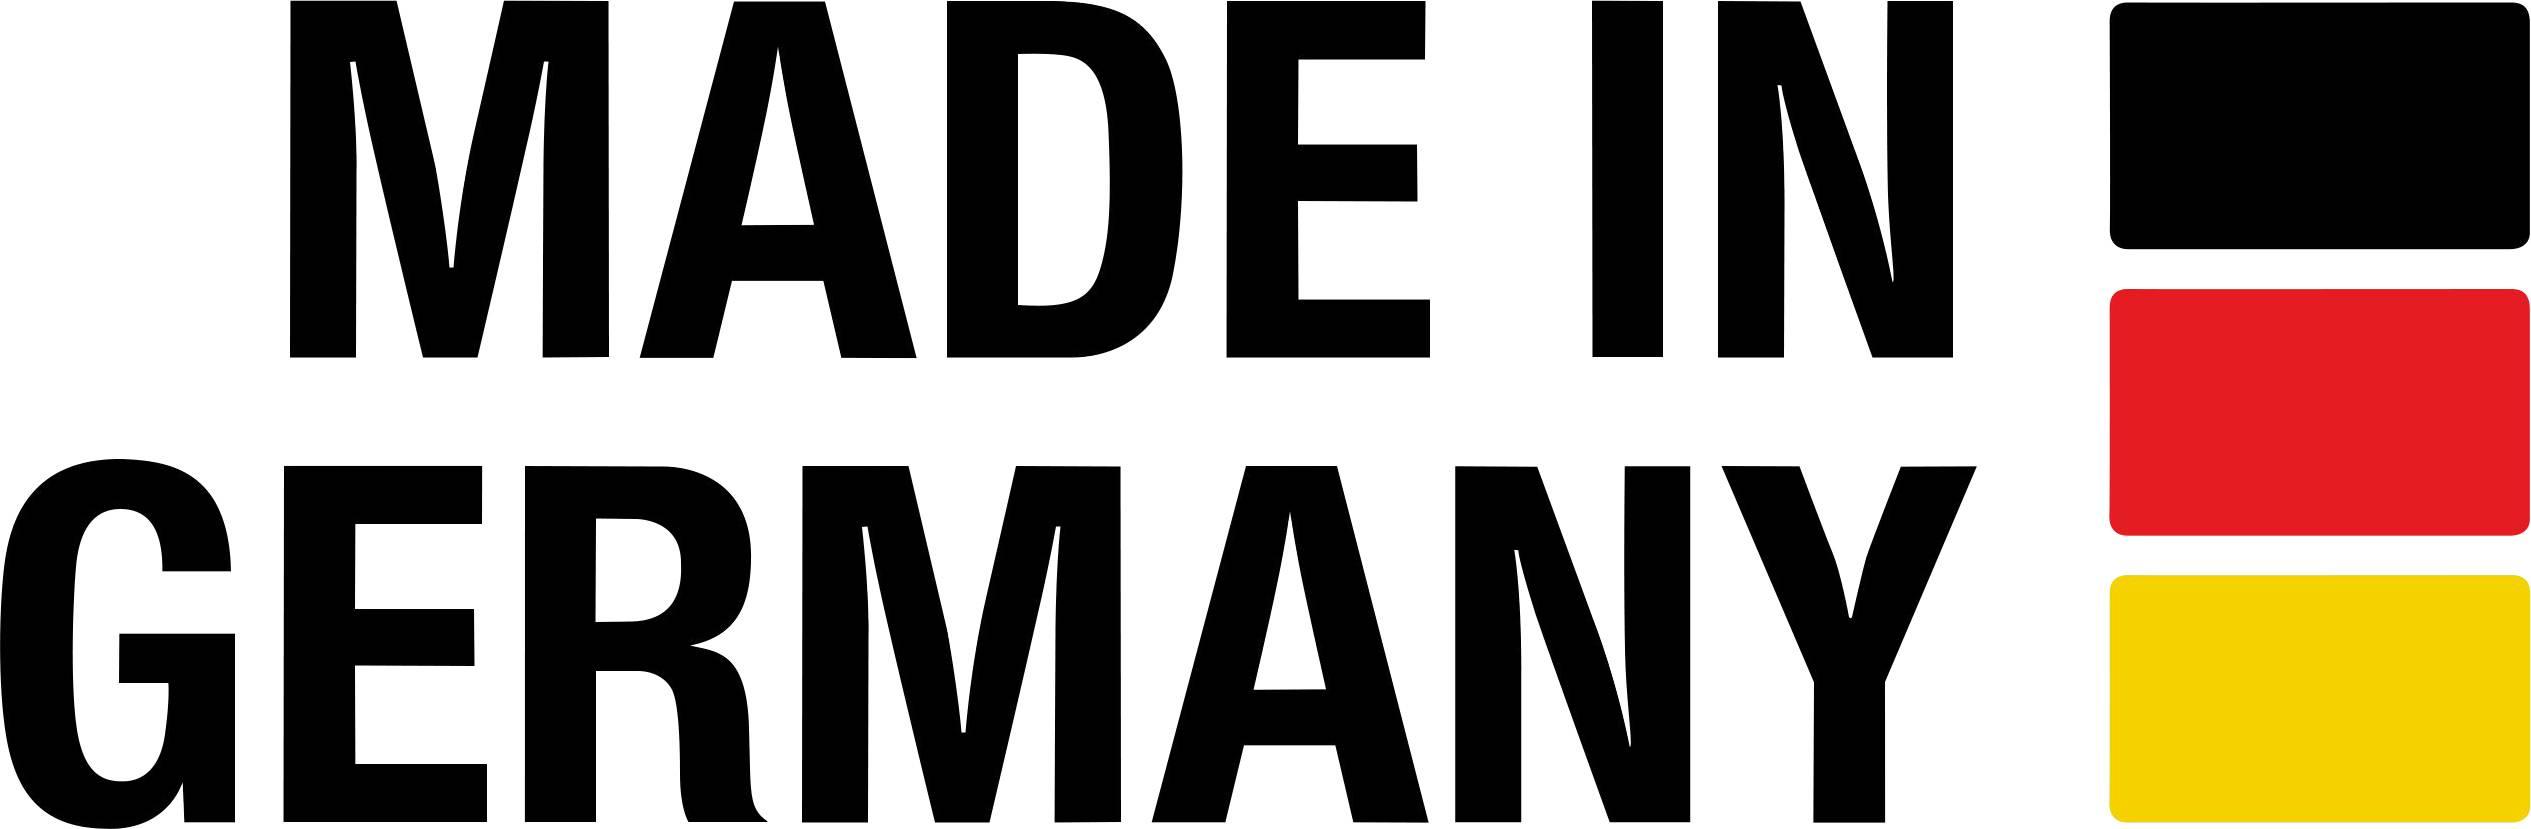 Adaptér káblovej priechodky Wiska APM 11/16, polyamid, 1 ks